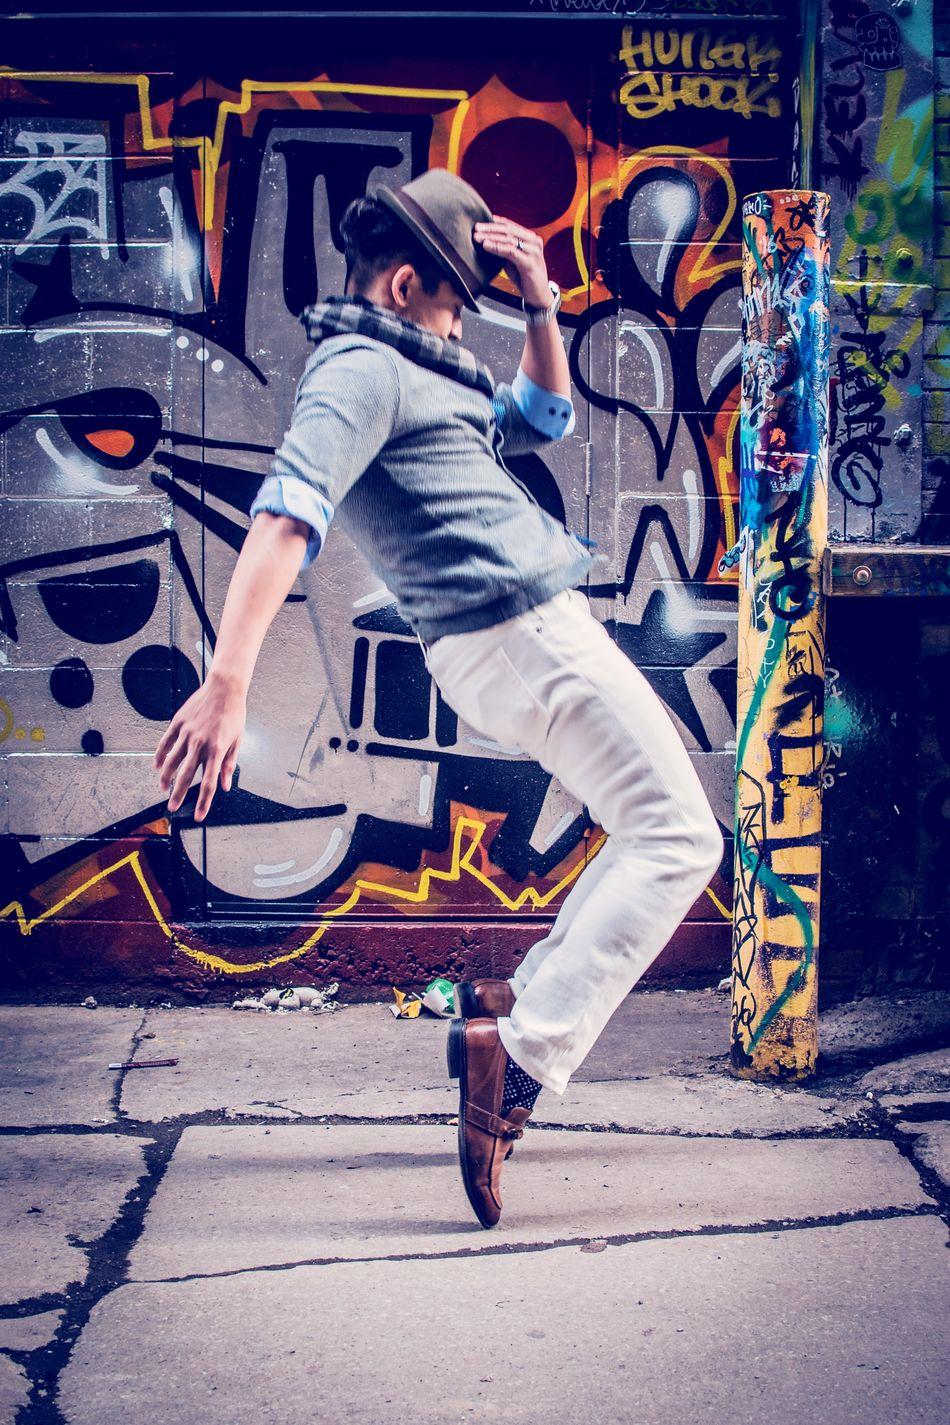 24K Magic One Person Jumping Outdoors Fashion Photography Young Adult EyeEm Graffittialley Graffitialleytoronto Streetart Street City Life Creativity Eye4photography  Torontophotography EyeEmToronto Streetphotography Adult Beautiful People Tiffphotography Architecture Cityscape Travel Destinations Toronto